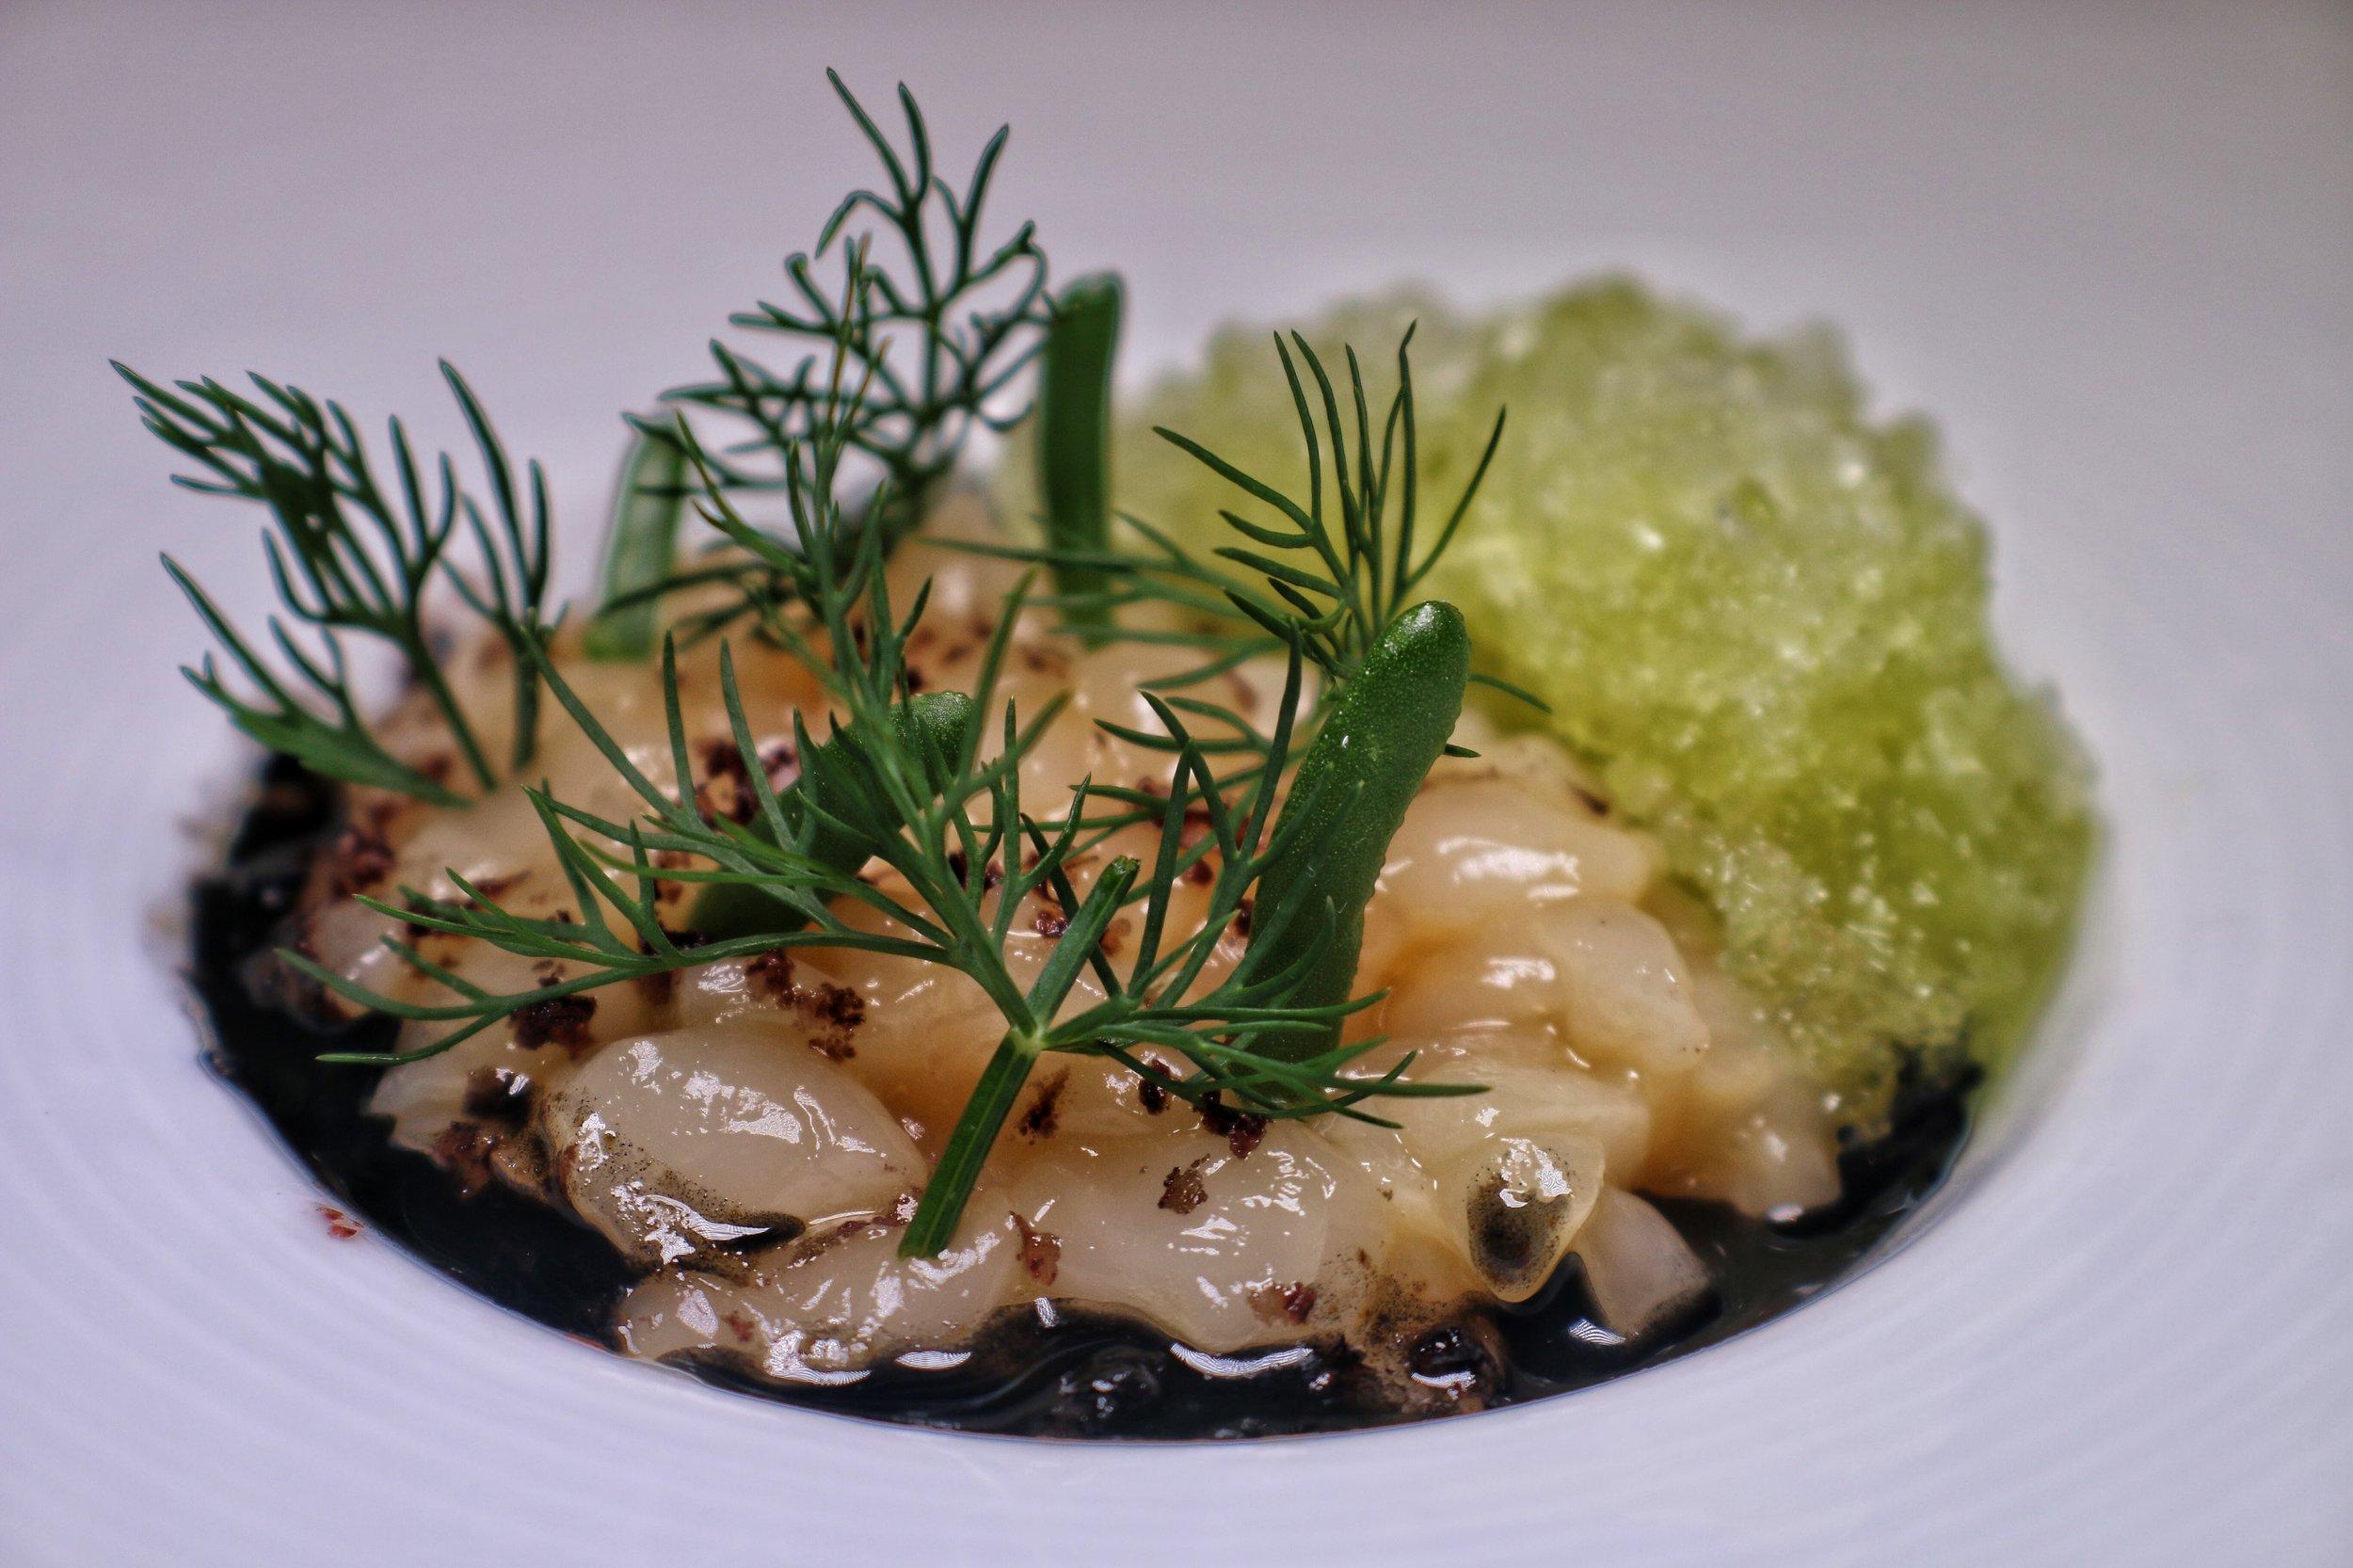 Scallop crudo, black olive and lemon, jalapeño ice